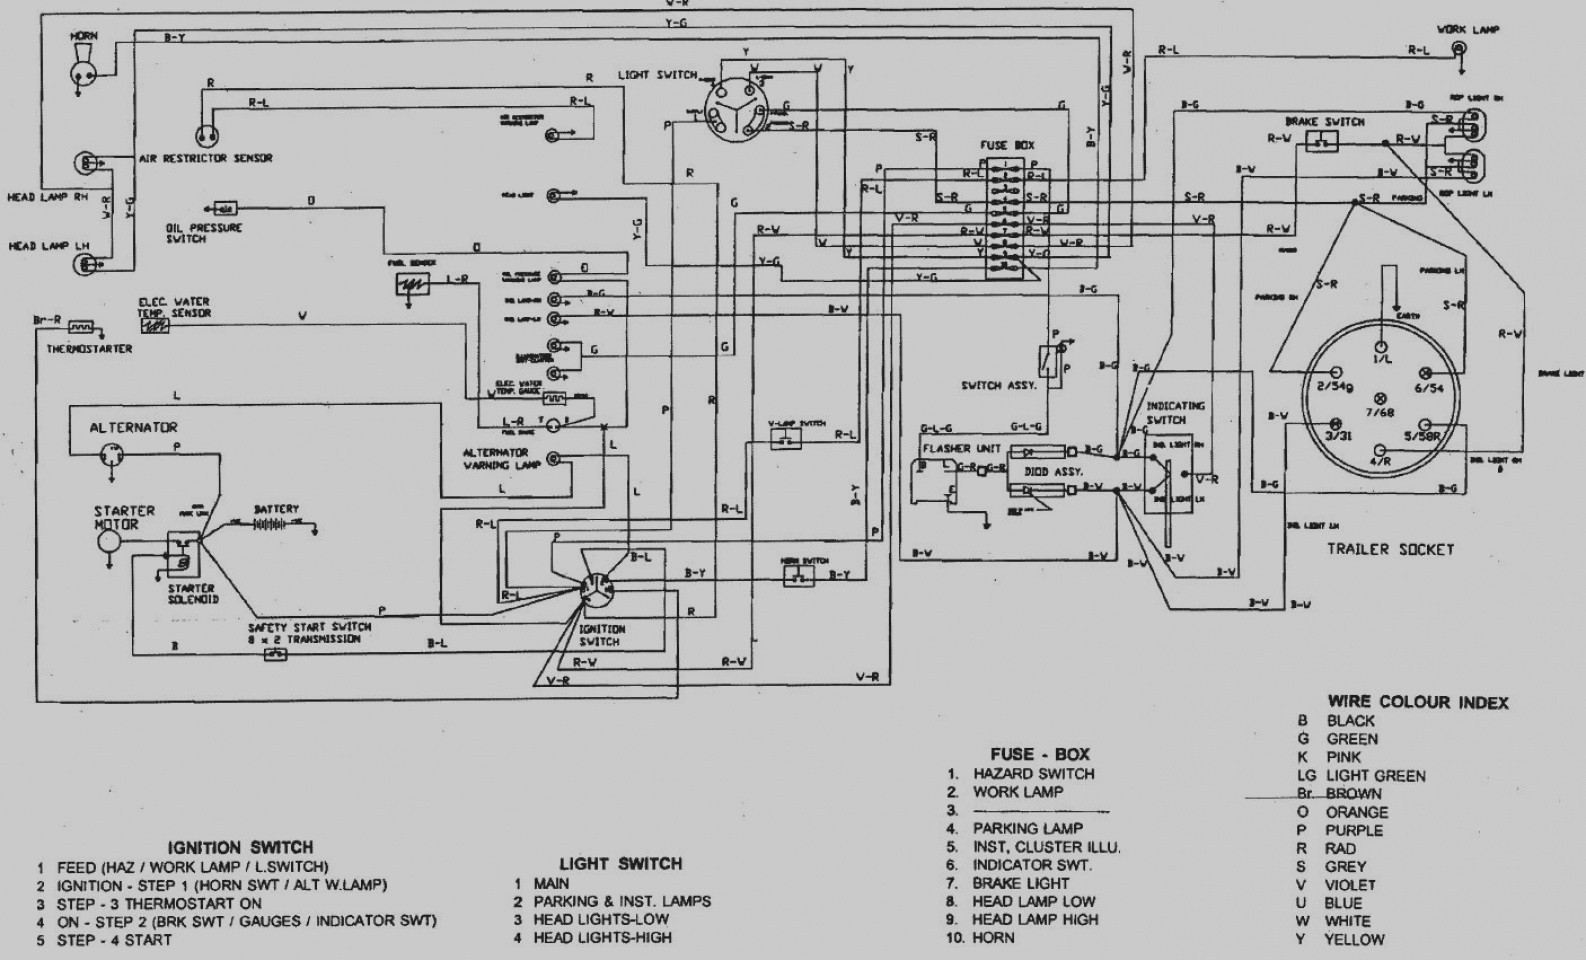 sabre lawn mower wiring diagram electrical wiring diagram software